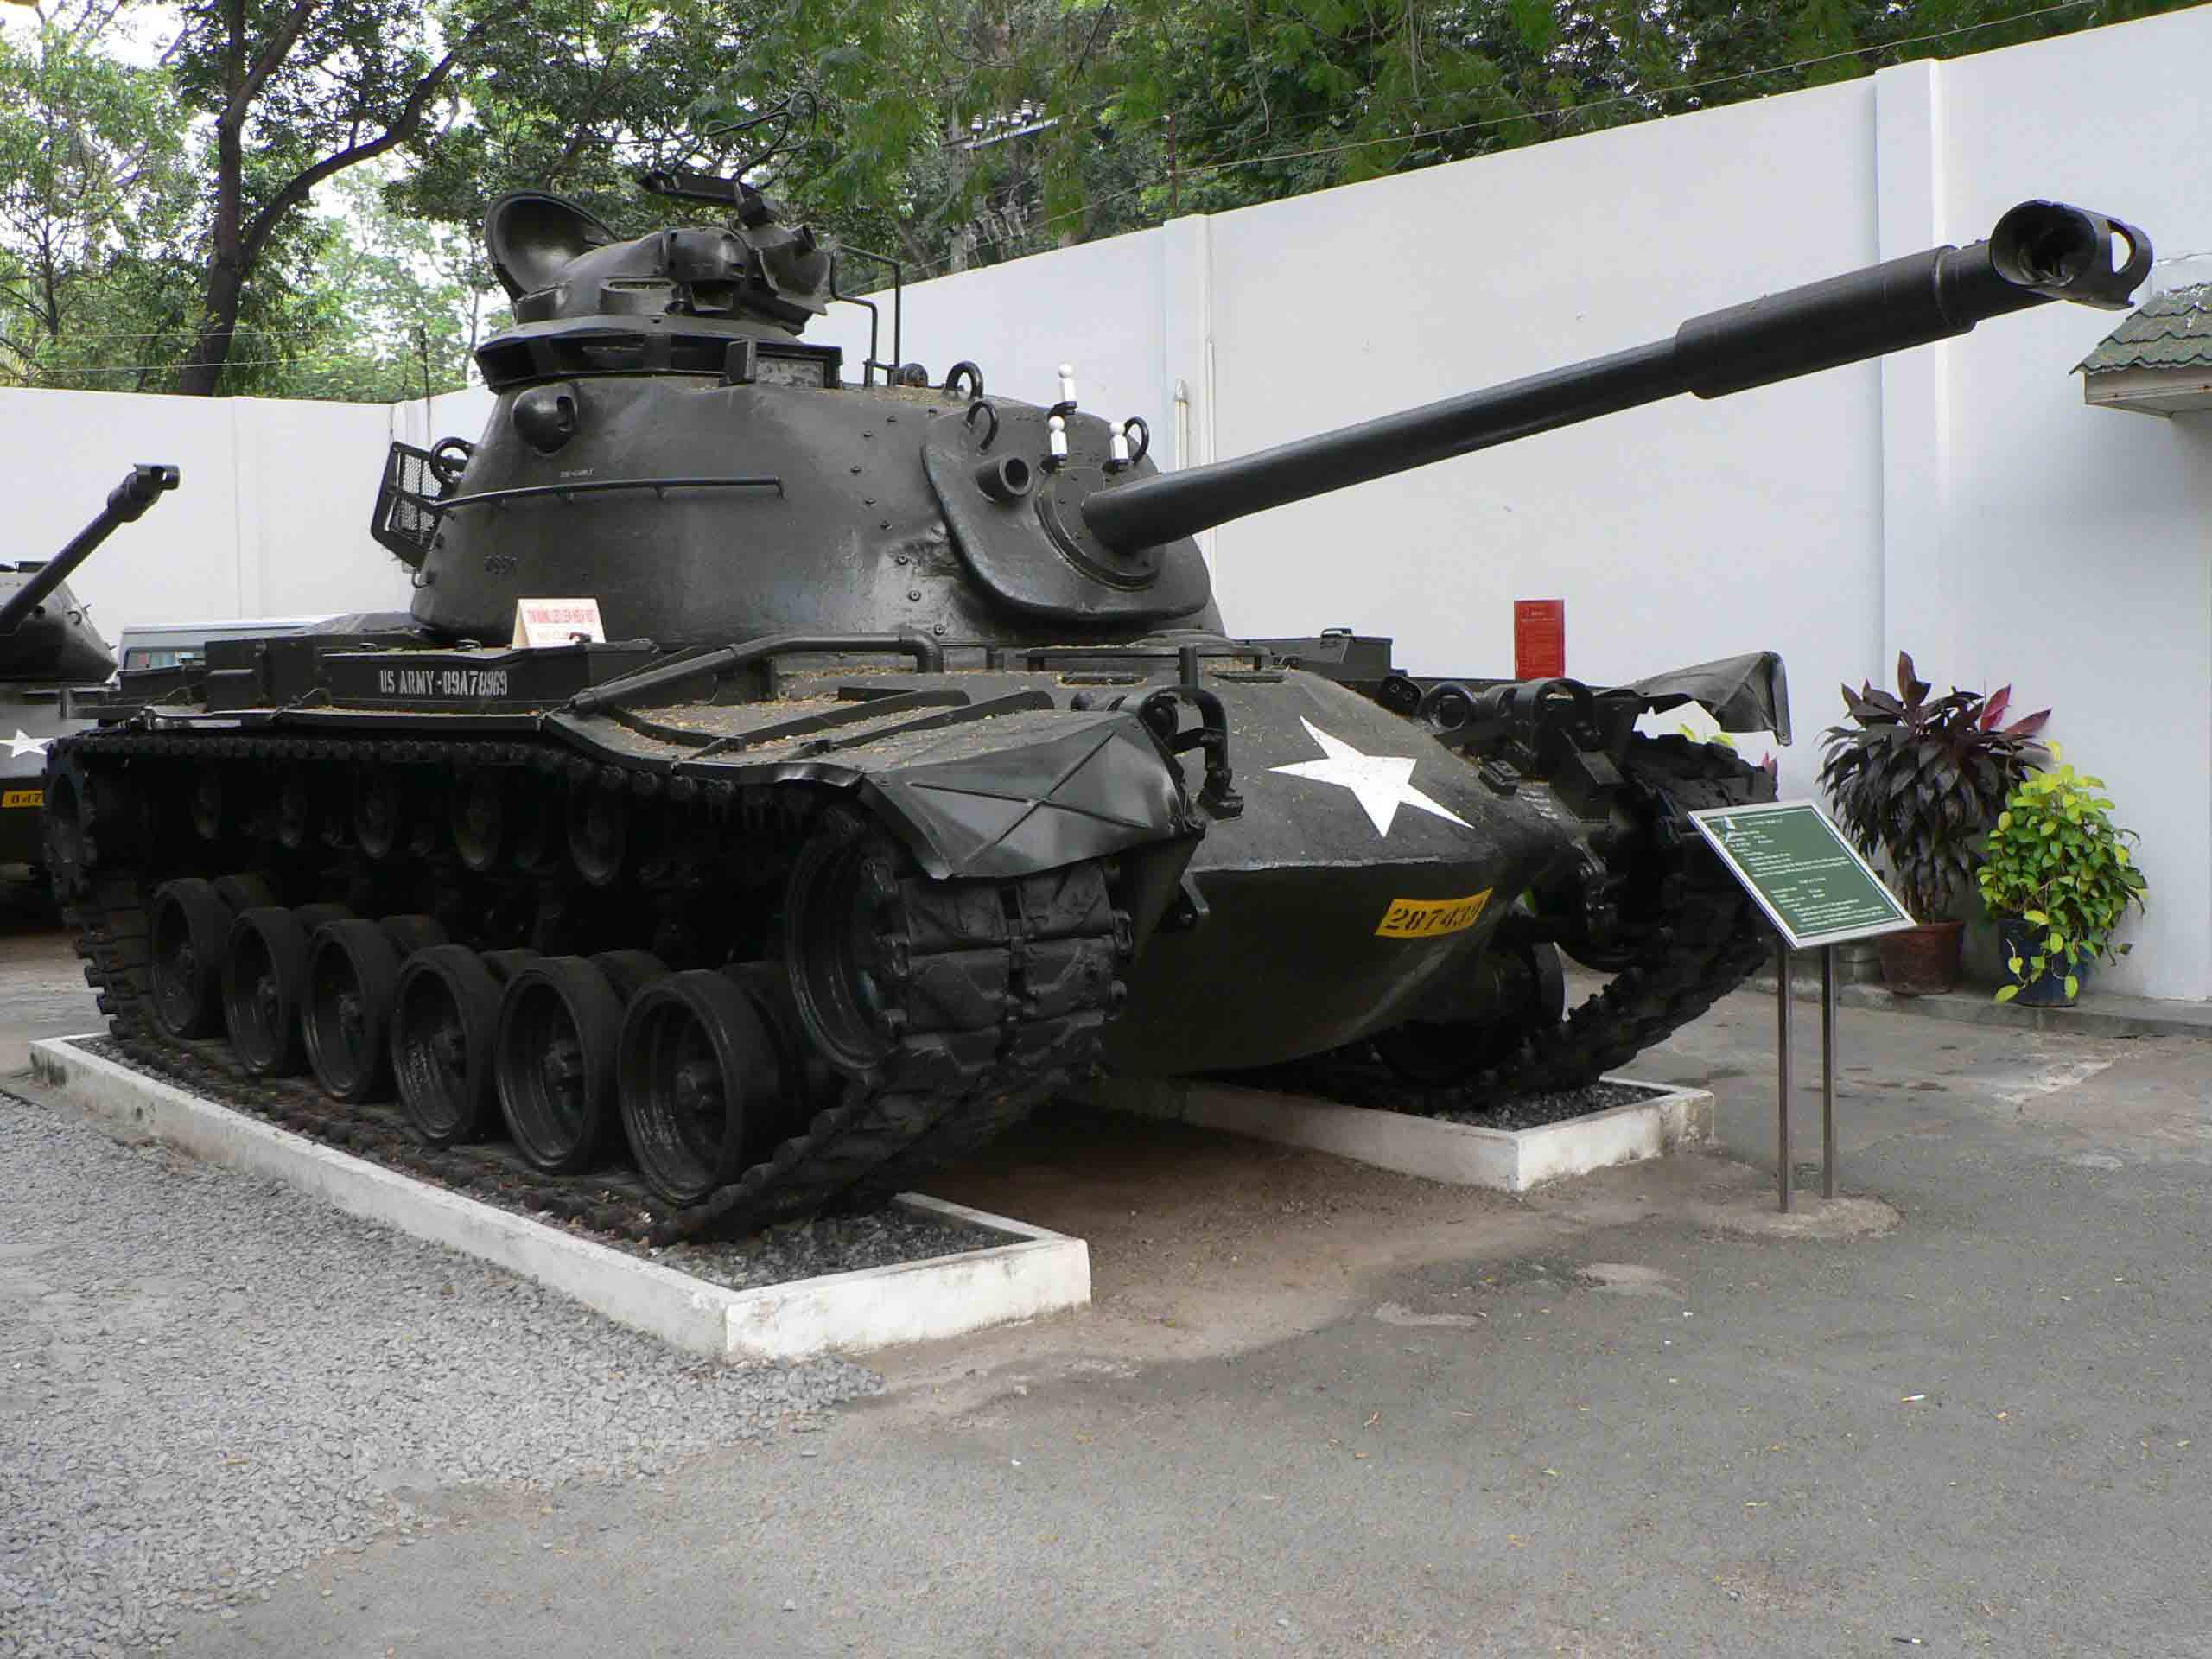 موزه جنگ War Remnants Museum